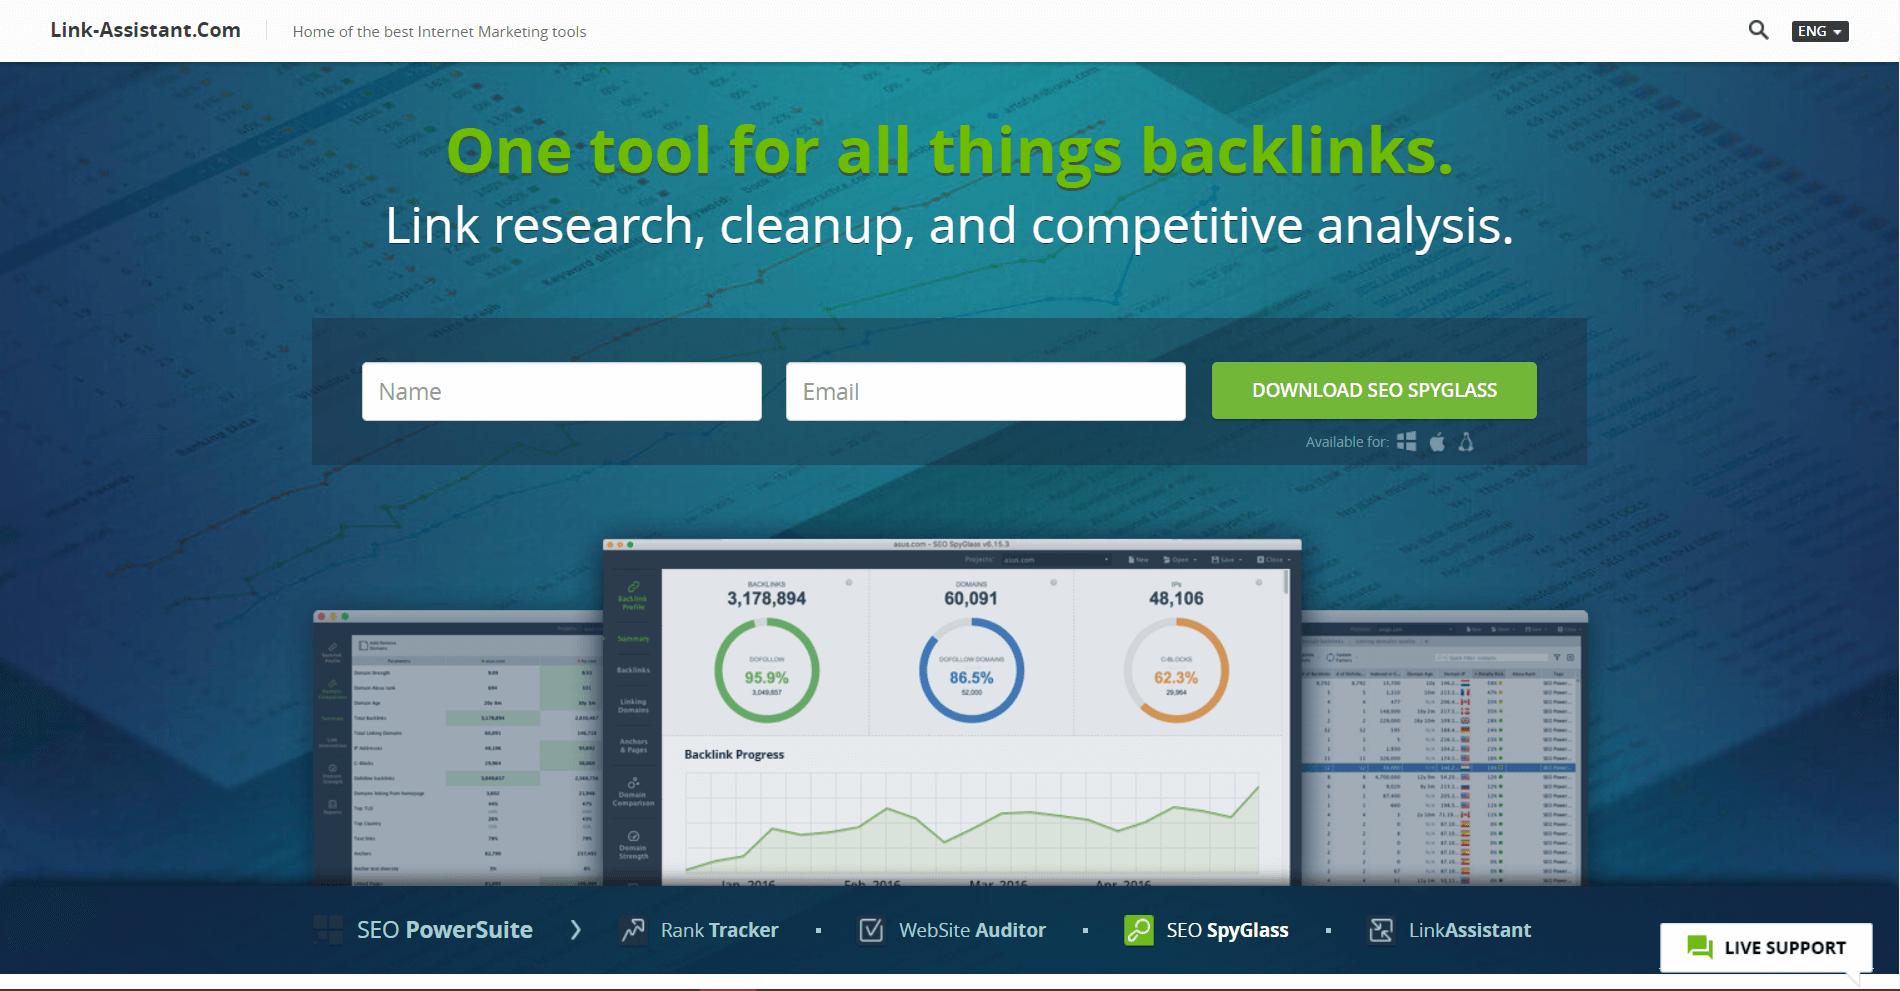 SEO SpyGlass Backlink Analysis Tool